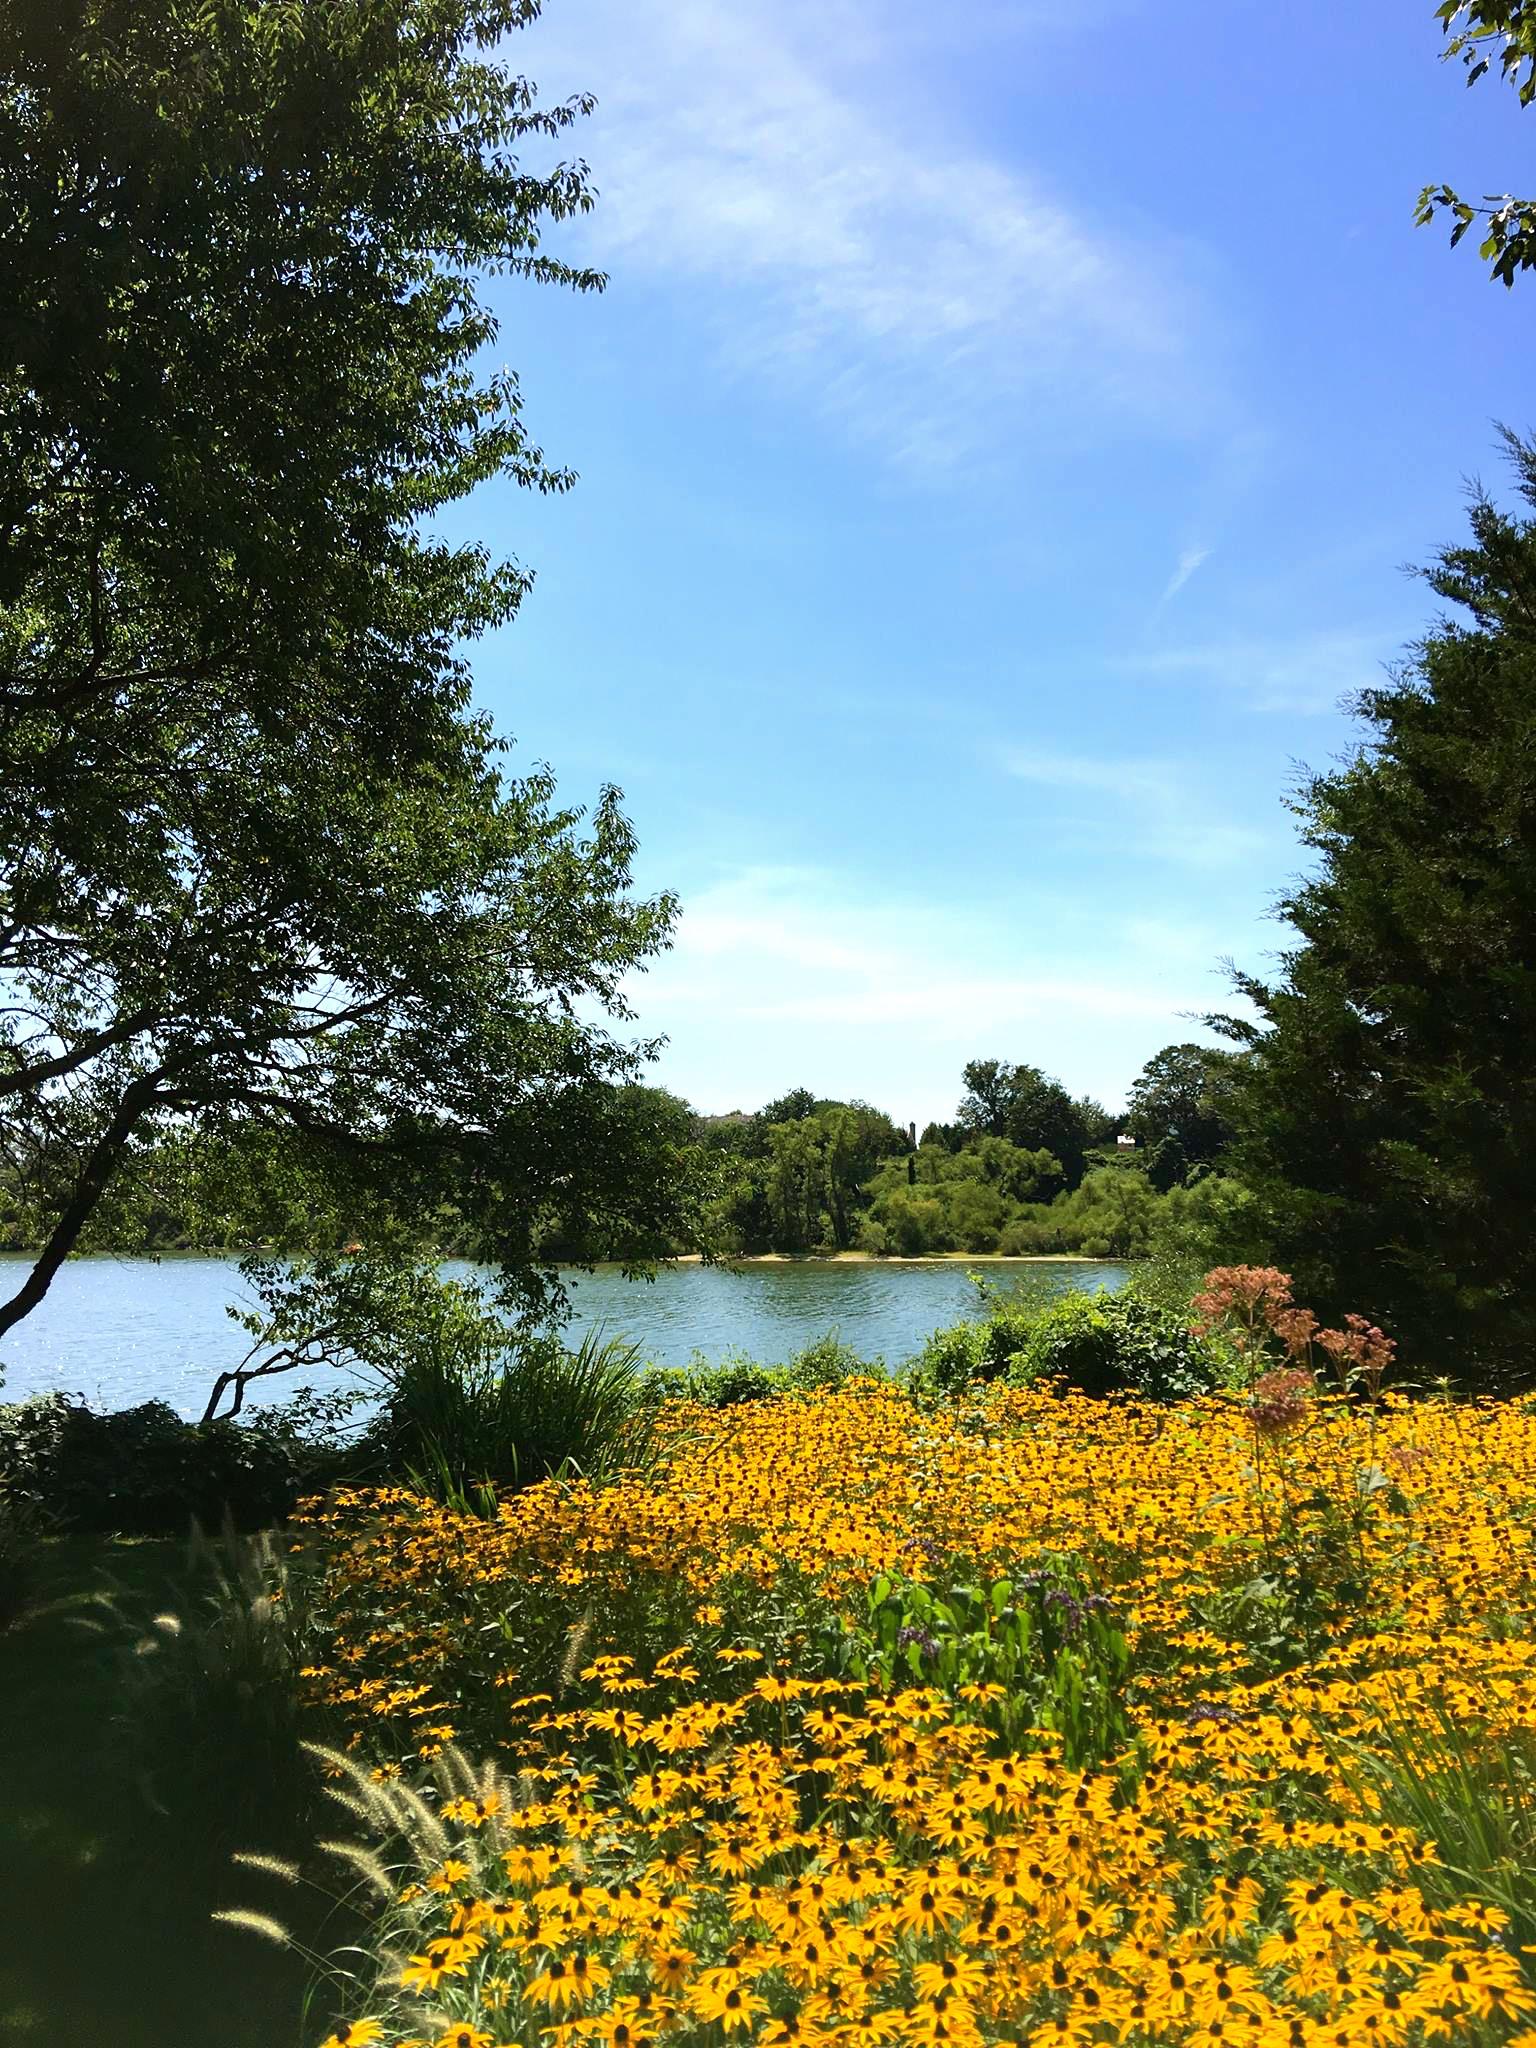 Adamson Garden Tour - Lake_Oct 27 2016.jpg